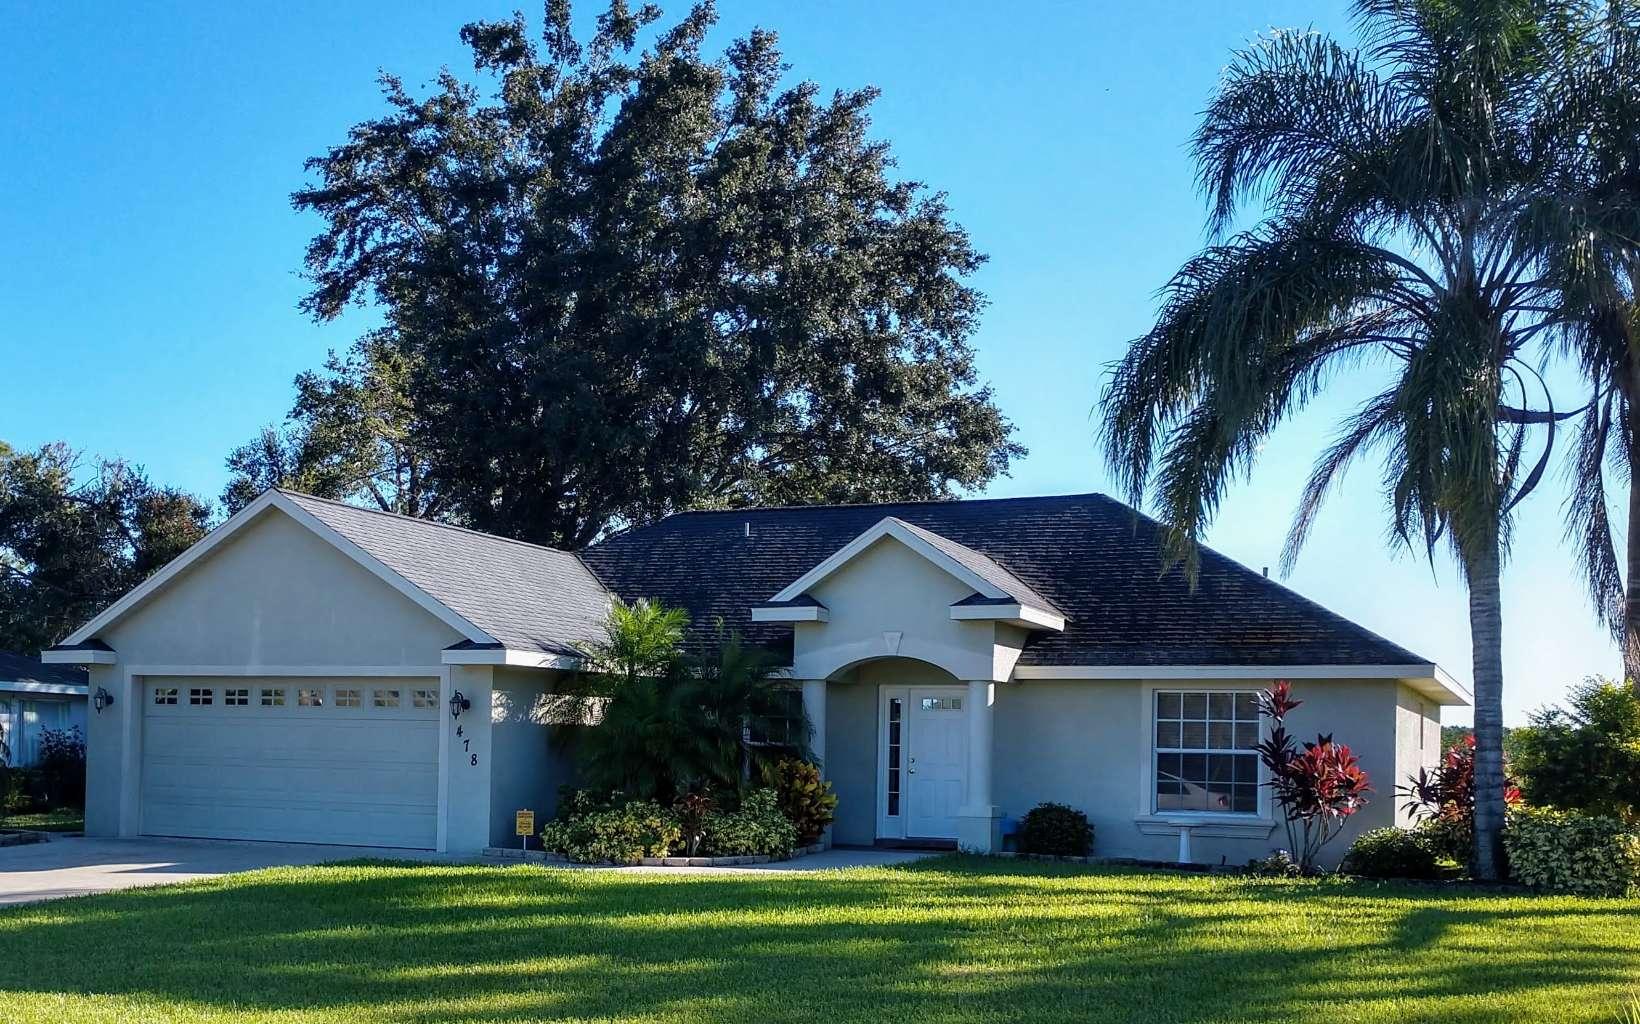 478 Humphrey Ave, Lake Placid, FL 33852